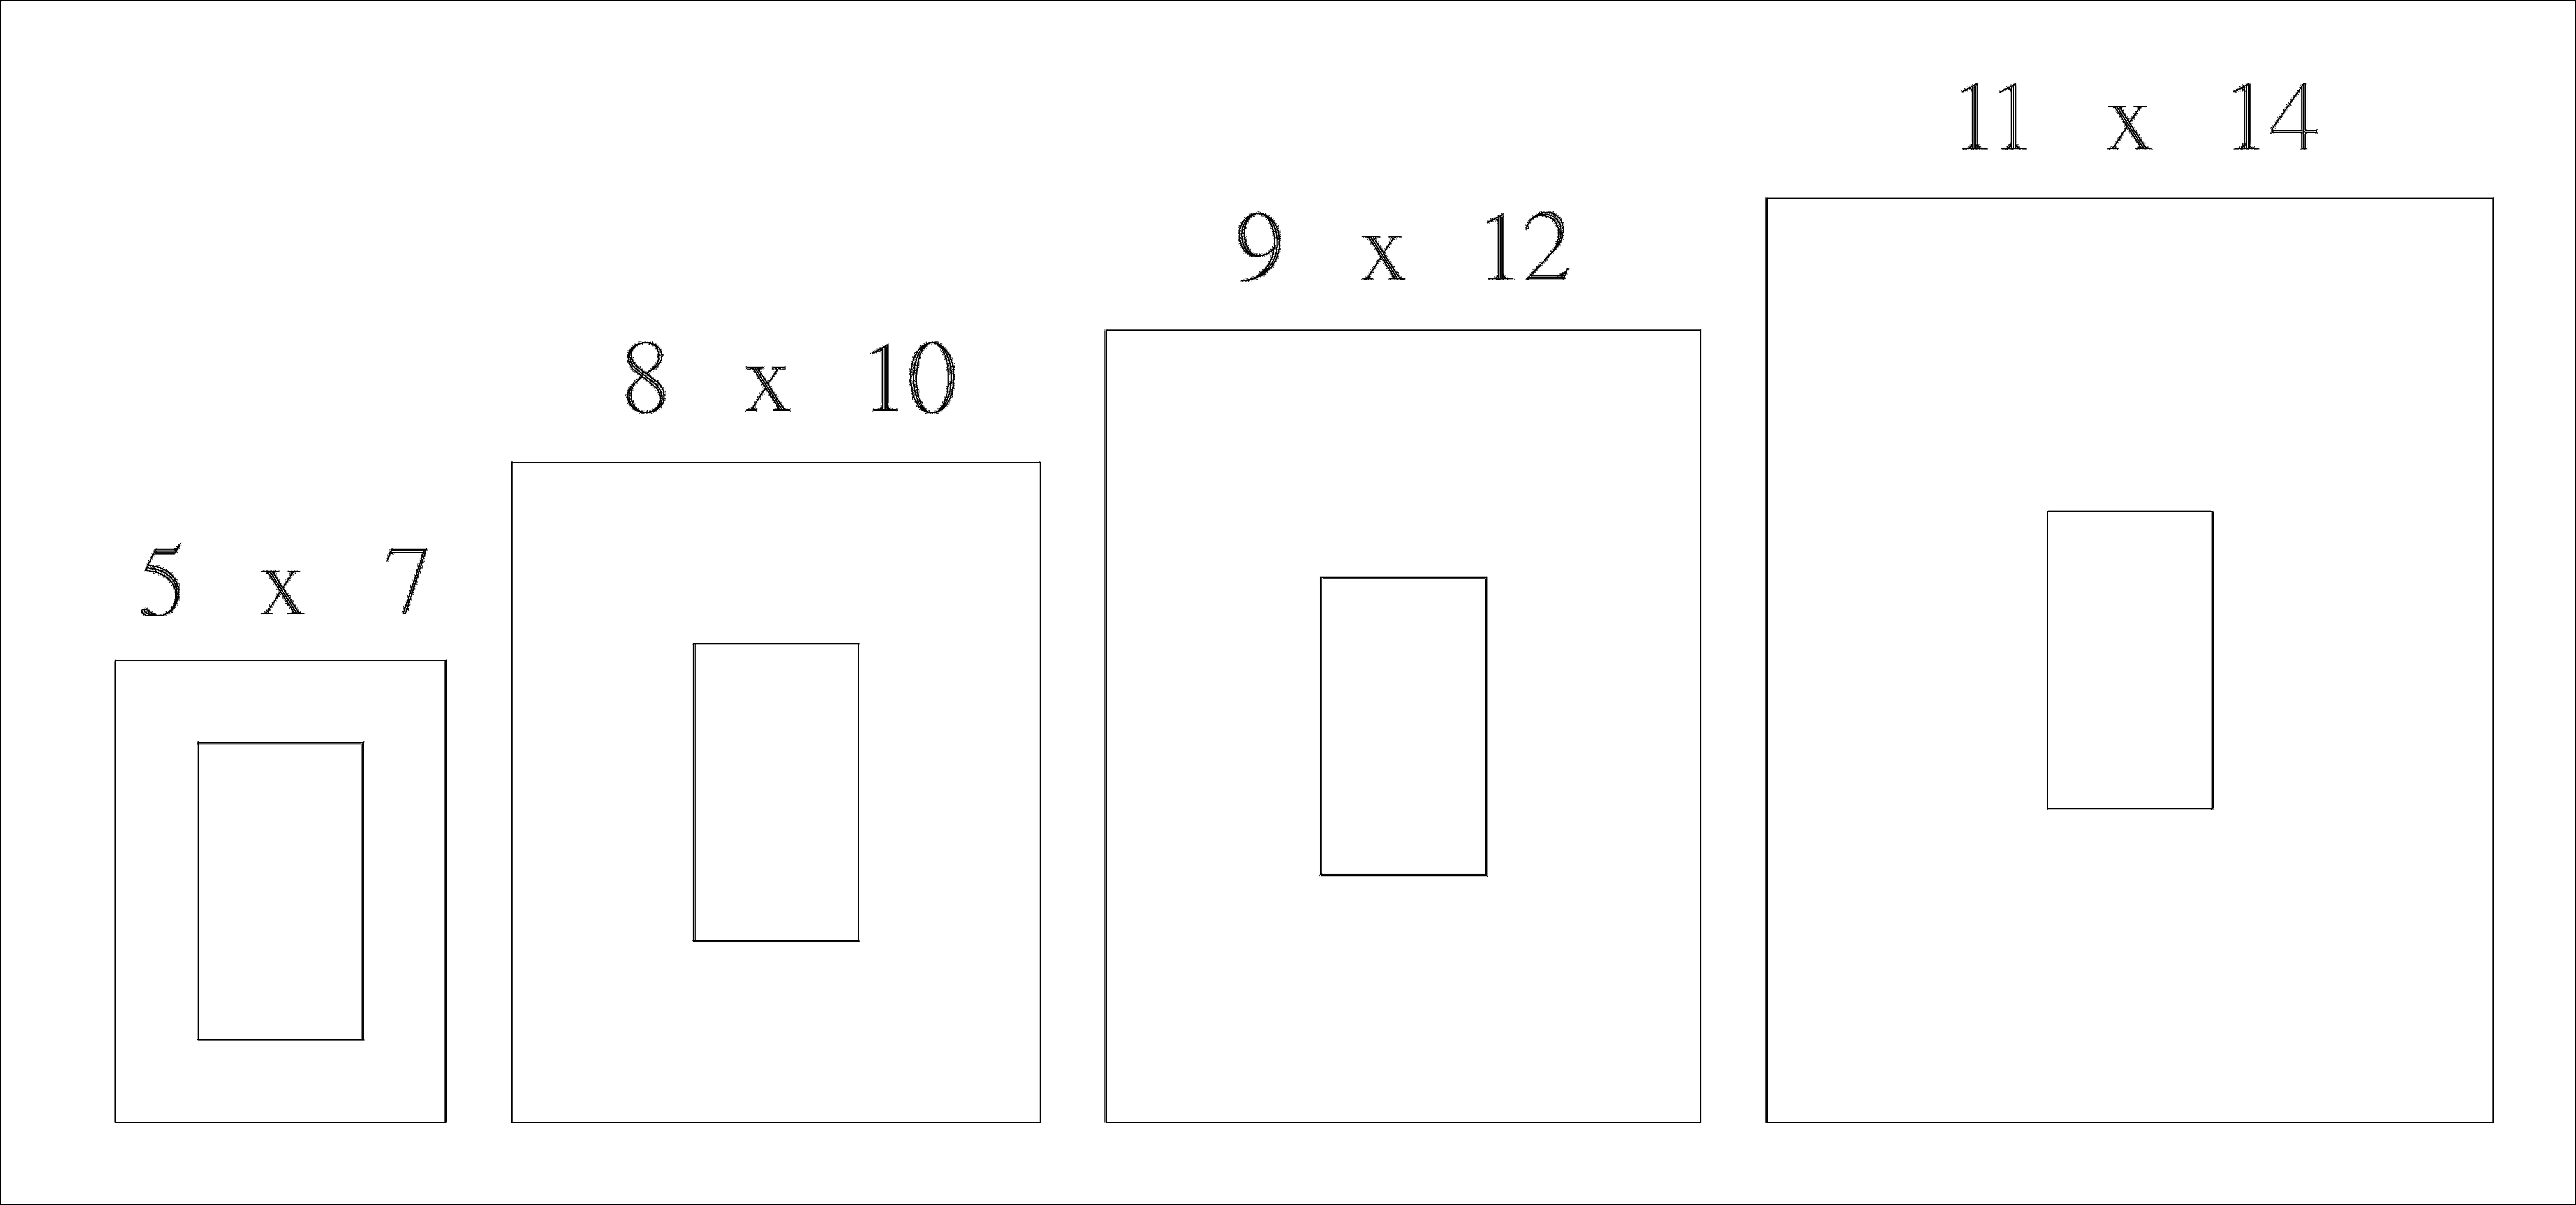 3-x-5-mat-drawings-copy-copy.png